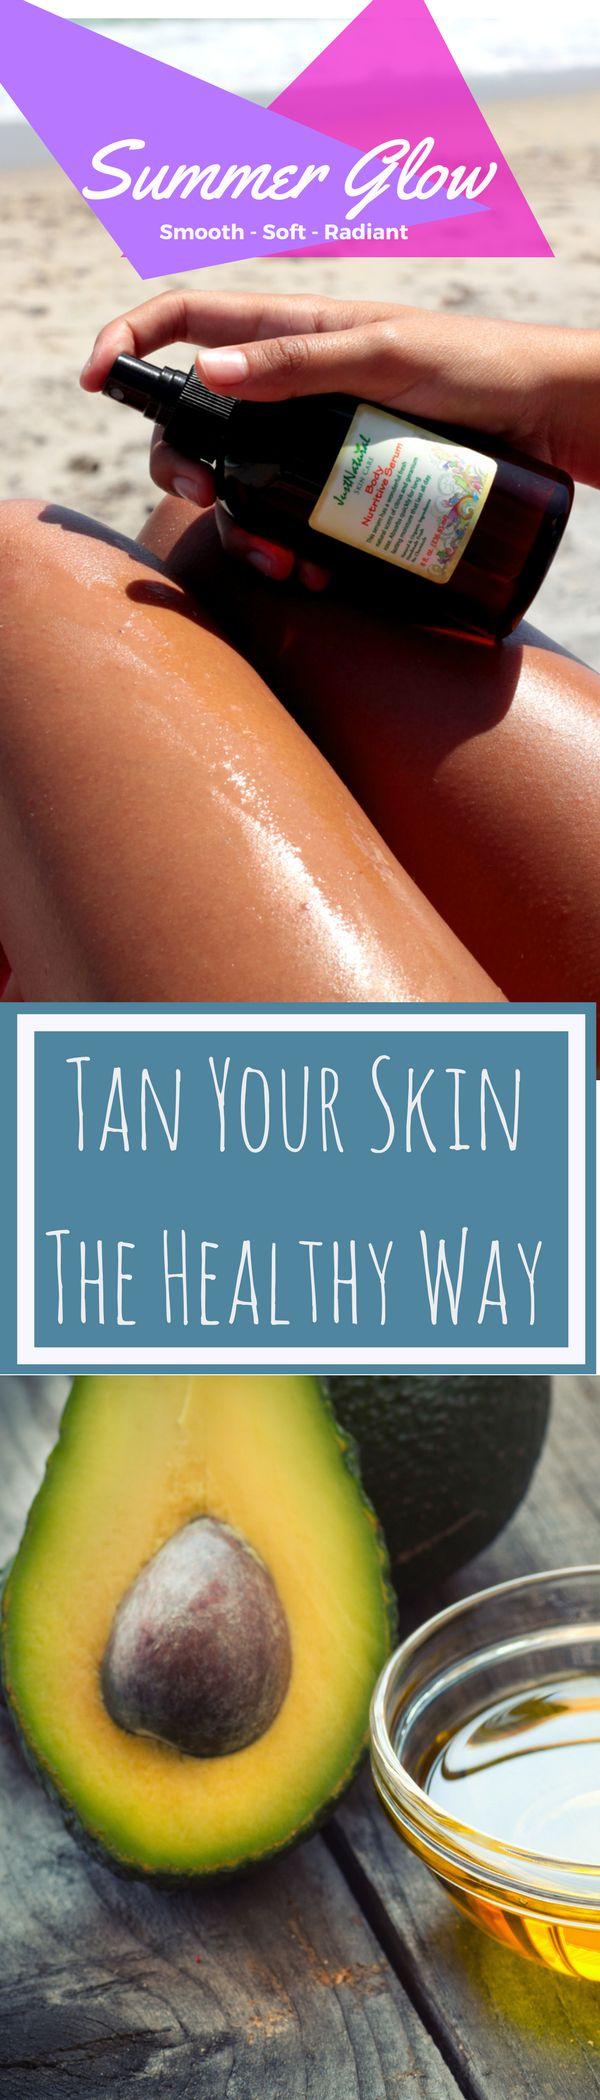 best beauty tips images on pinterest beauty tips beauty hacks